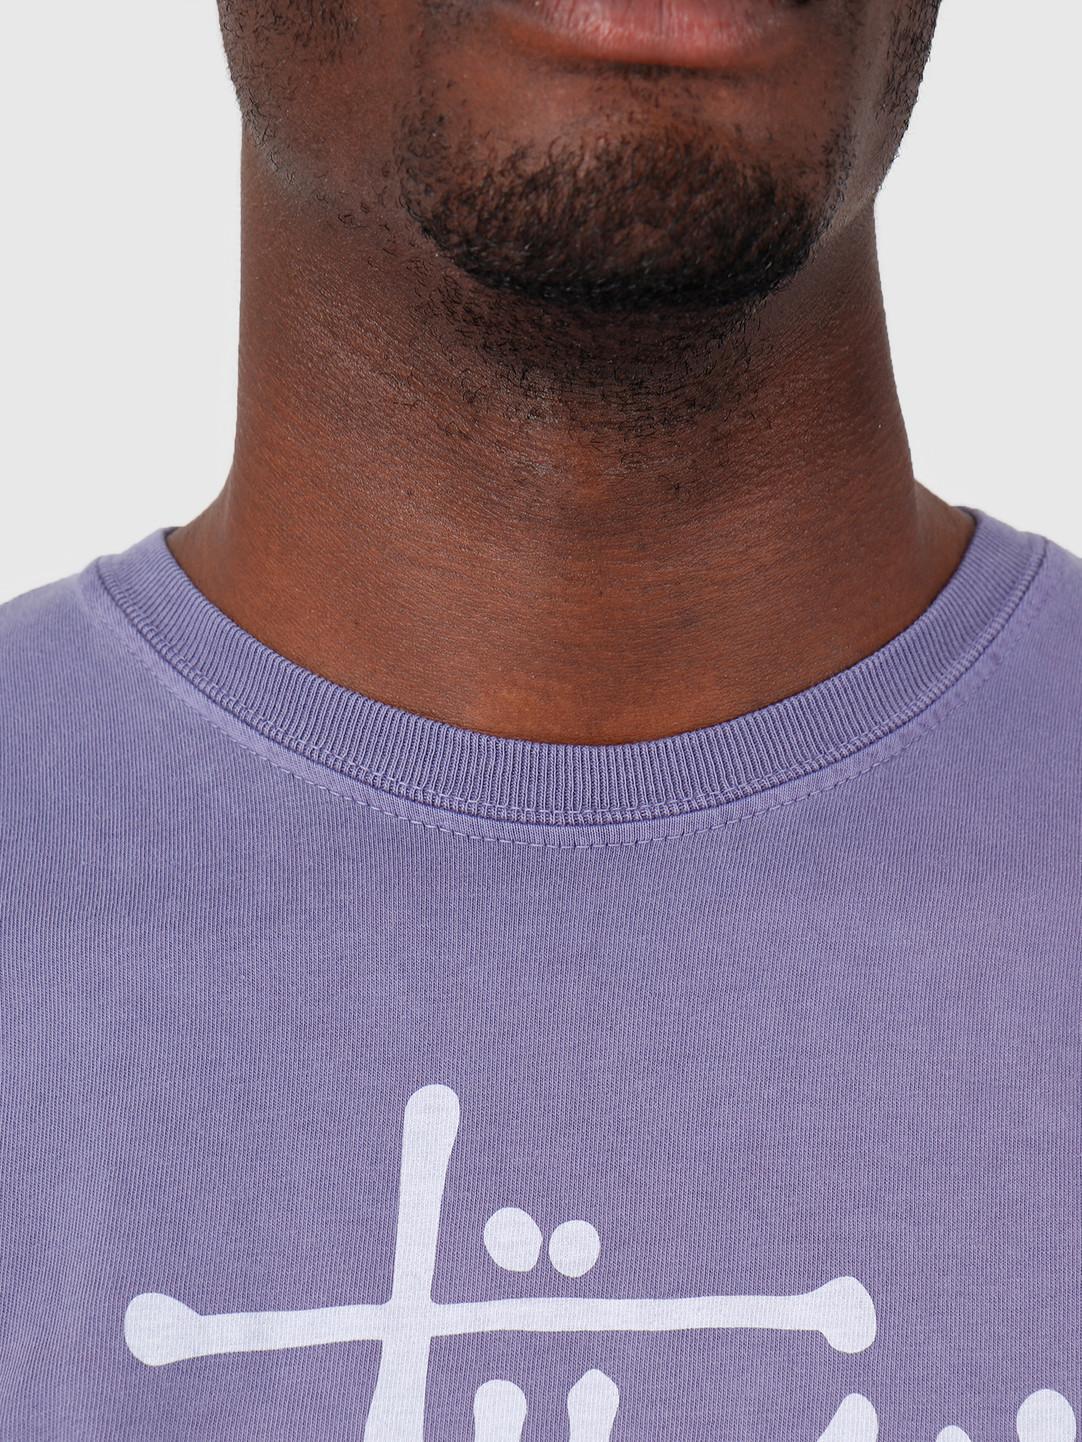 Stussy Stussy Tour Pig Dyed T-Shirt Purple 0809